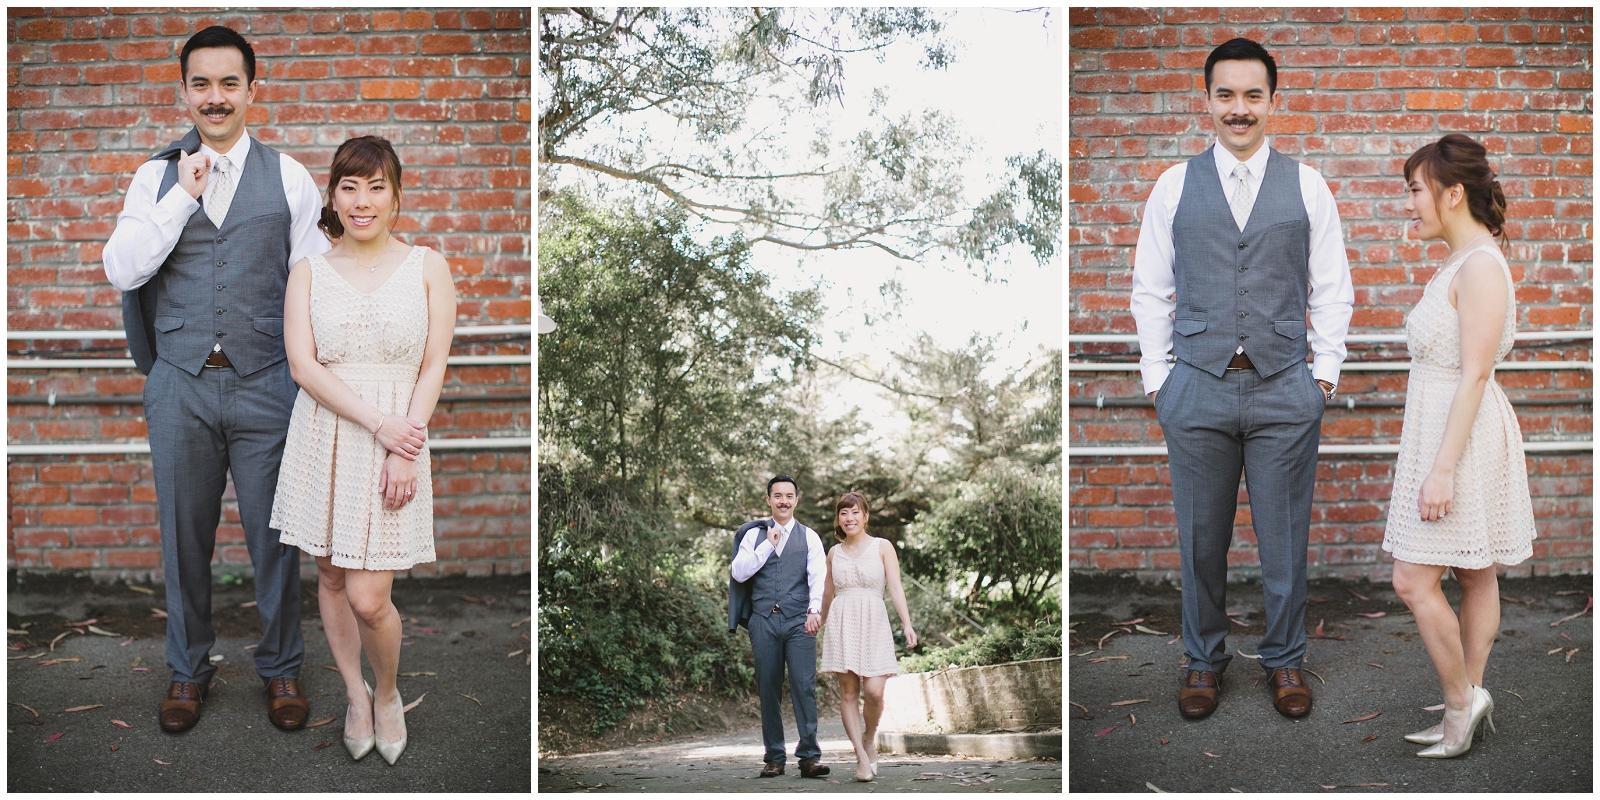 San-Francisco-Bay-Area-Wedding-Photography-Engagement-Treasure-Island-9.jpg